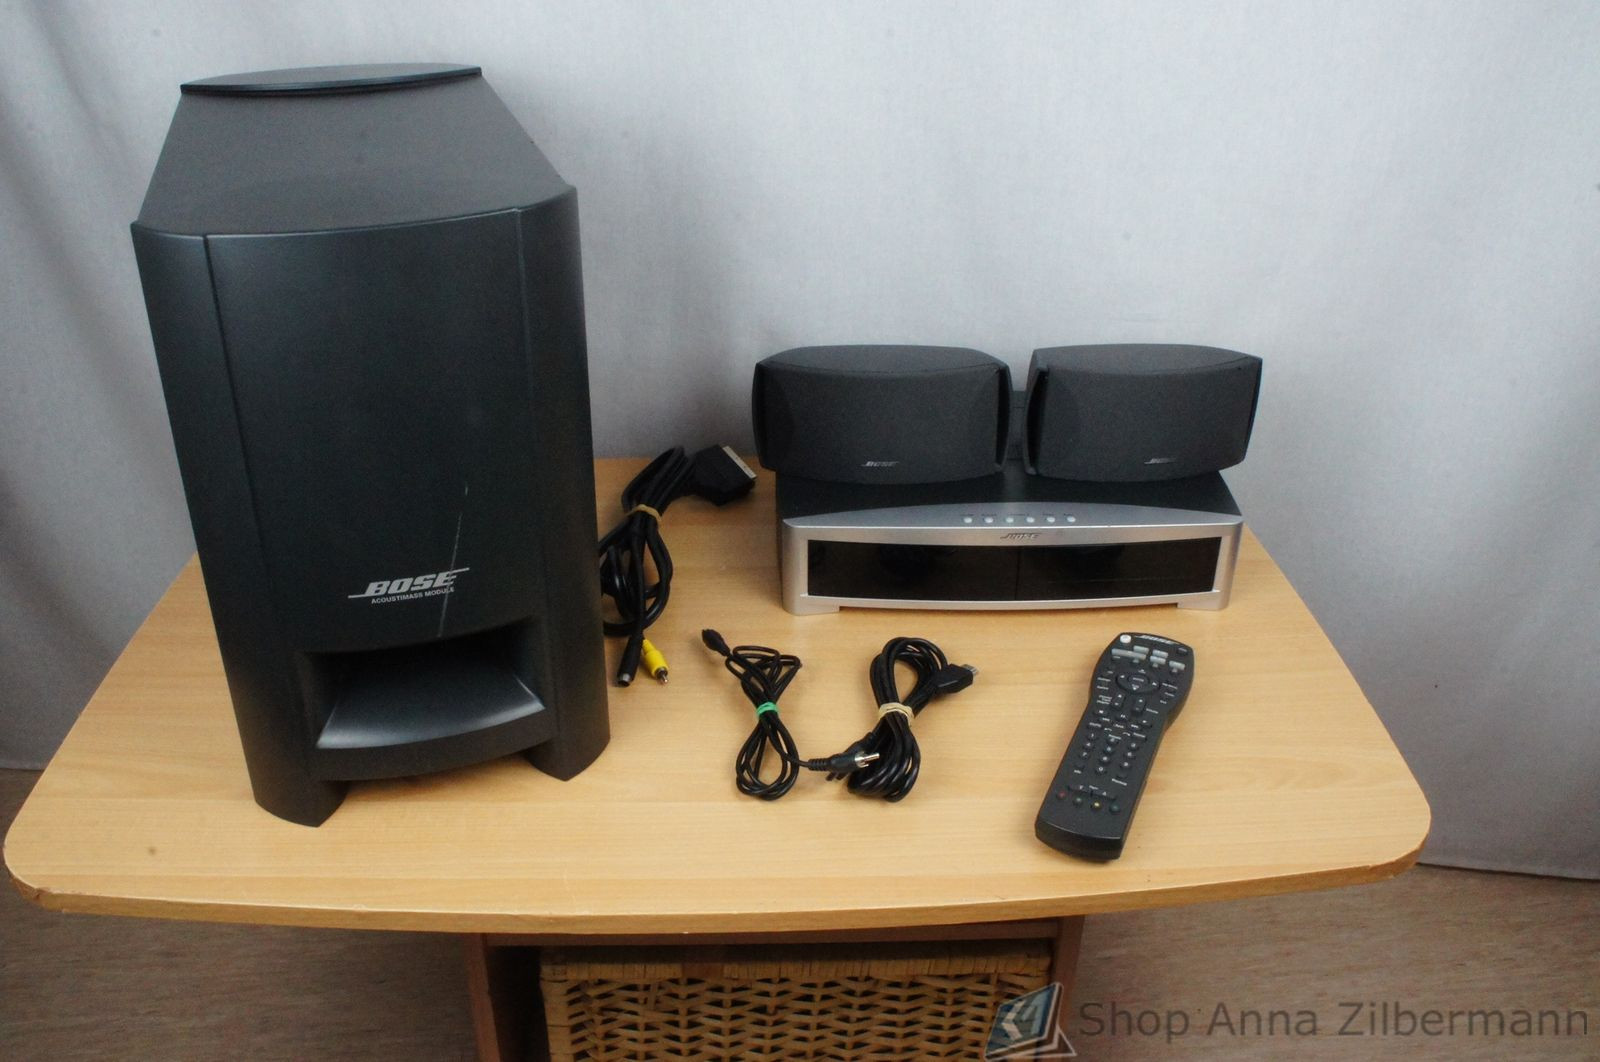 bose 321 3 2 1 series ii heimkino system ebay. Black Bedroom Furniture Sets. Home Design Ideas